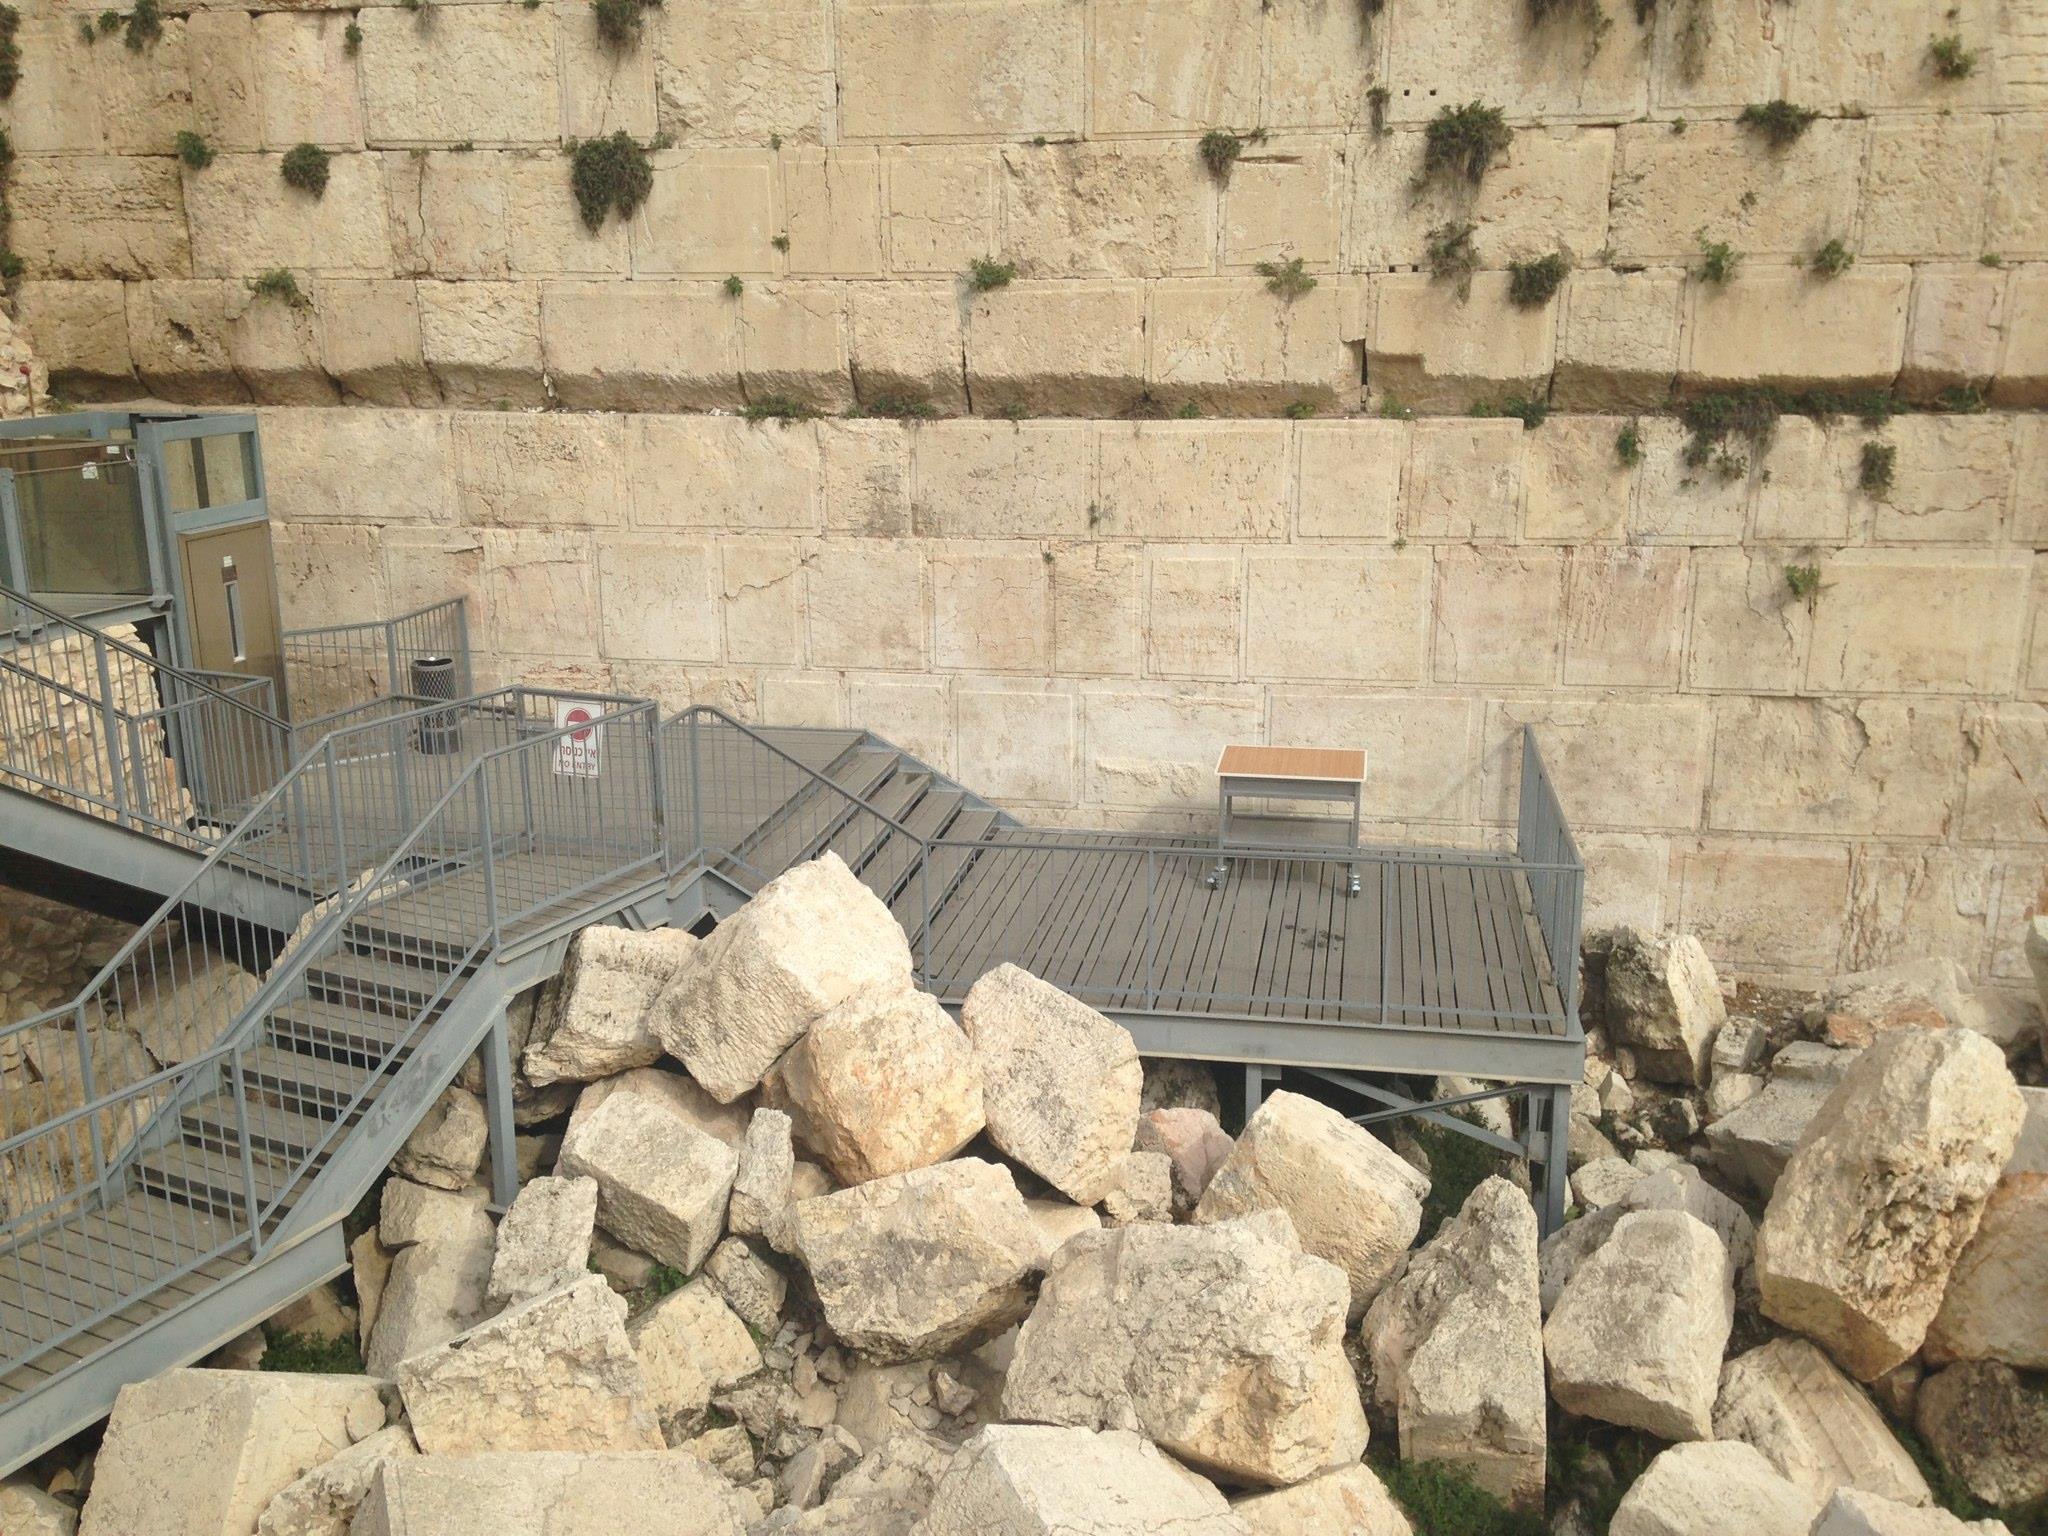 The Western Wall's Egalitarian Prayer Plaza